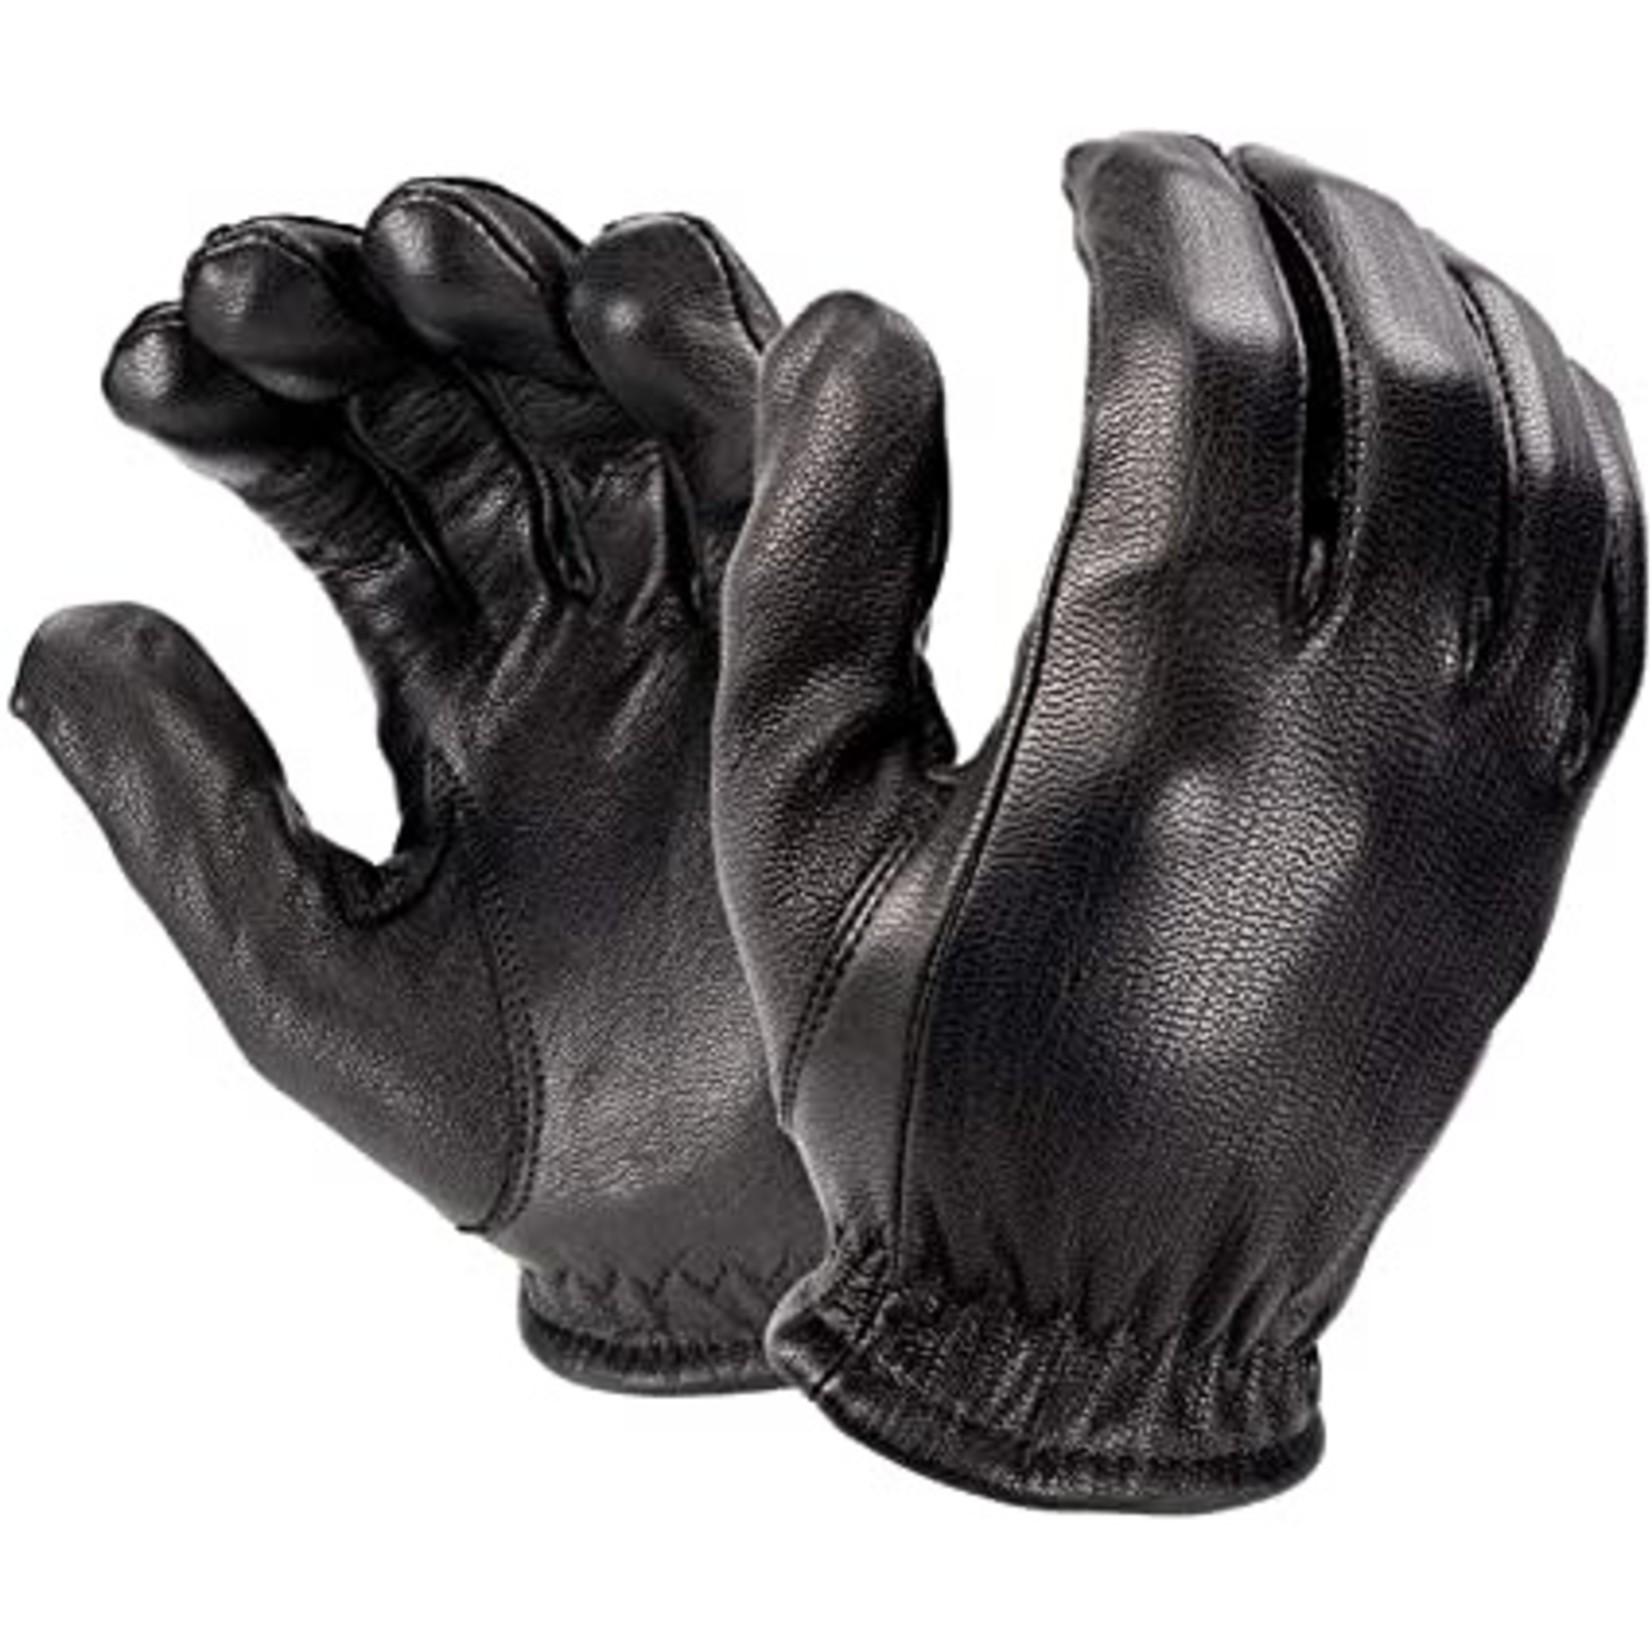 5.11 Tactical Hatch Friskmaster Gloves W/Honeywell Spectra